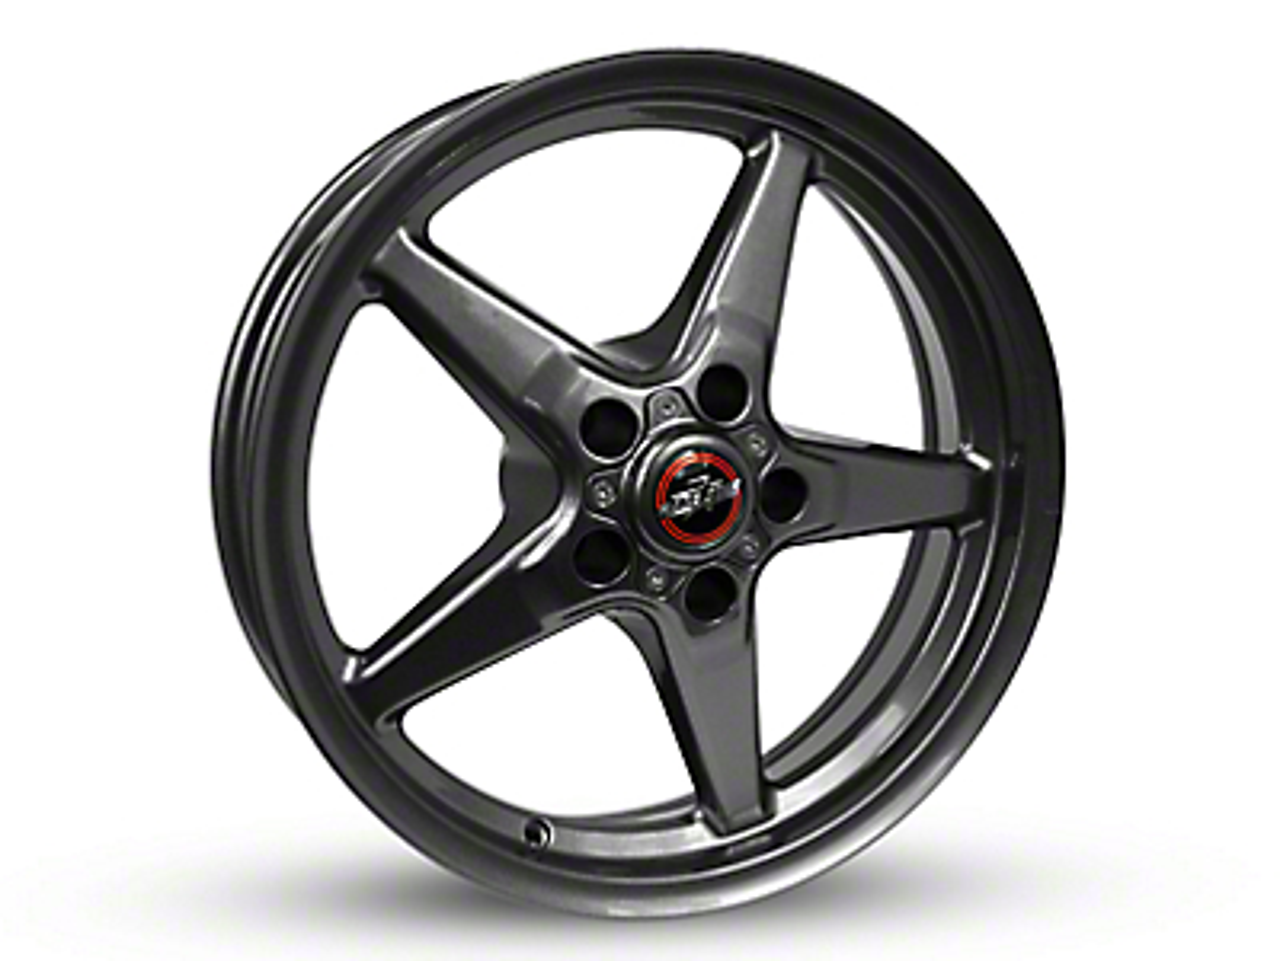 Race Star 92 Drag Star Bracket Racer Metallic Gray Wheel - 15x10 (87-93 w/ 5 Lug Conversion)